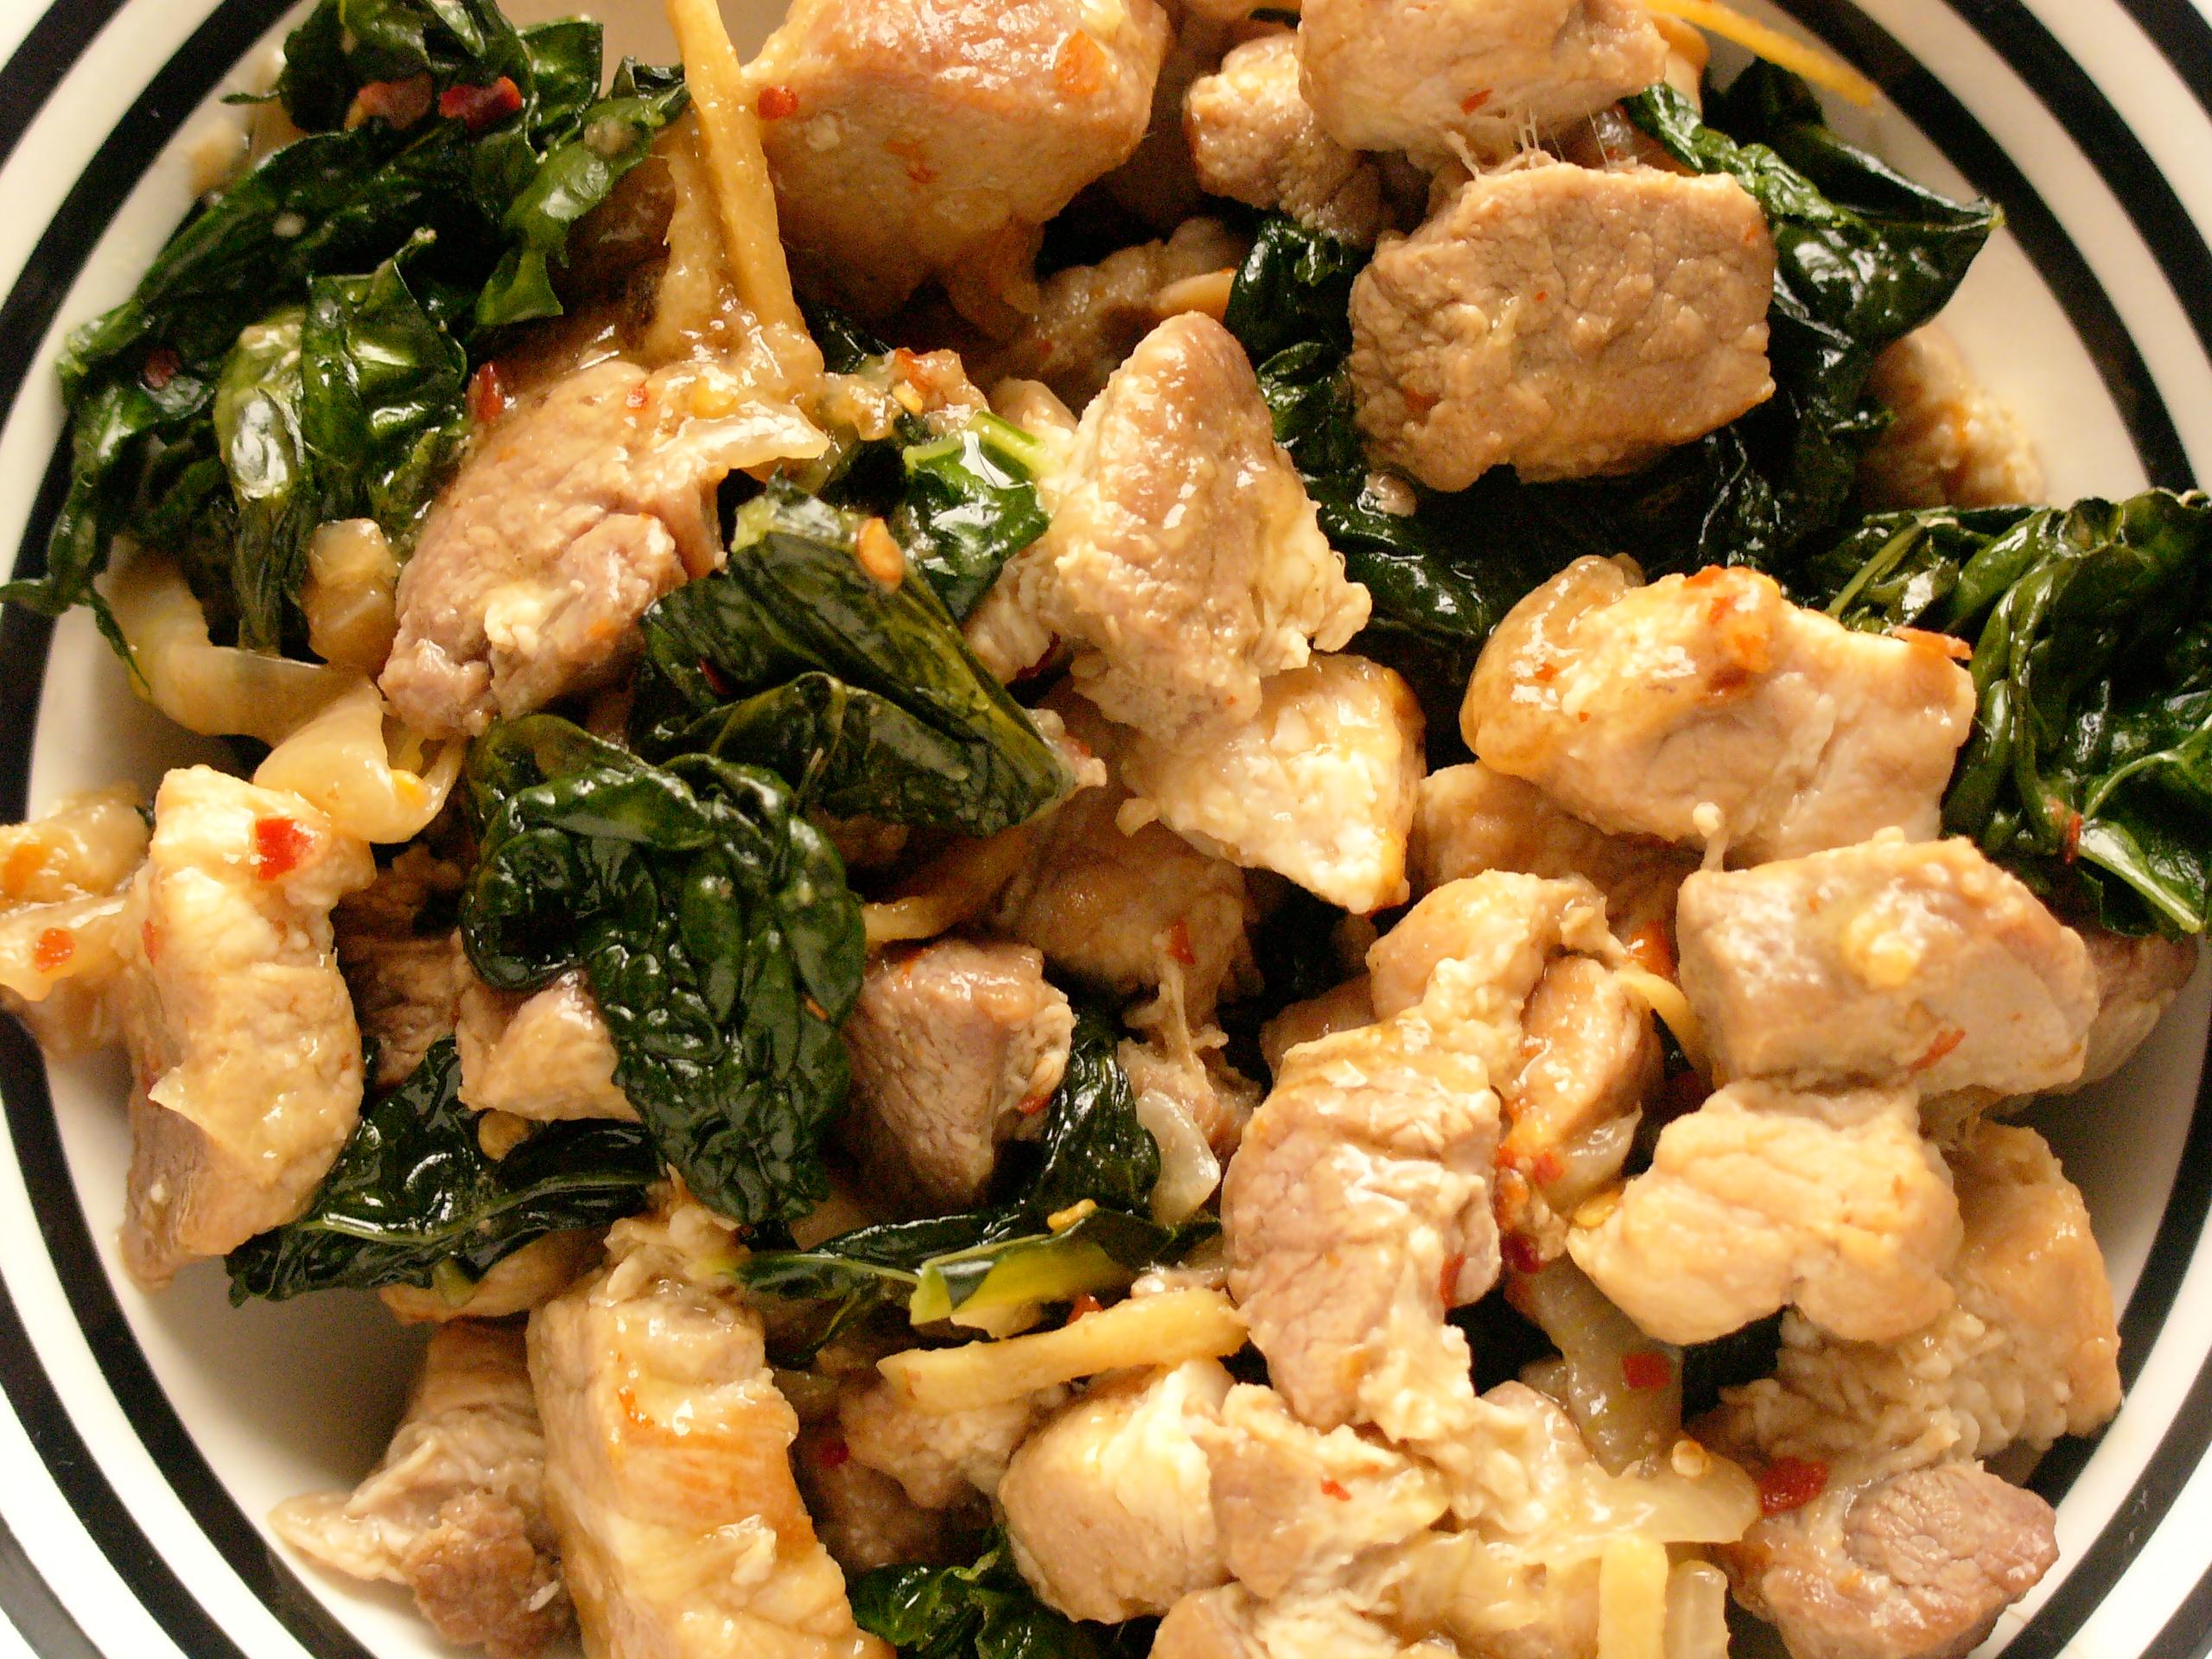 Uyen Luu's pork belly with coconut milk and greens